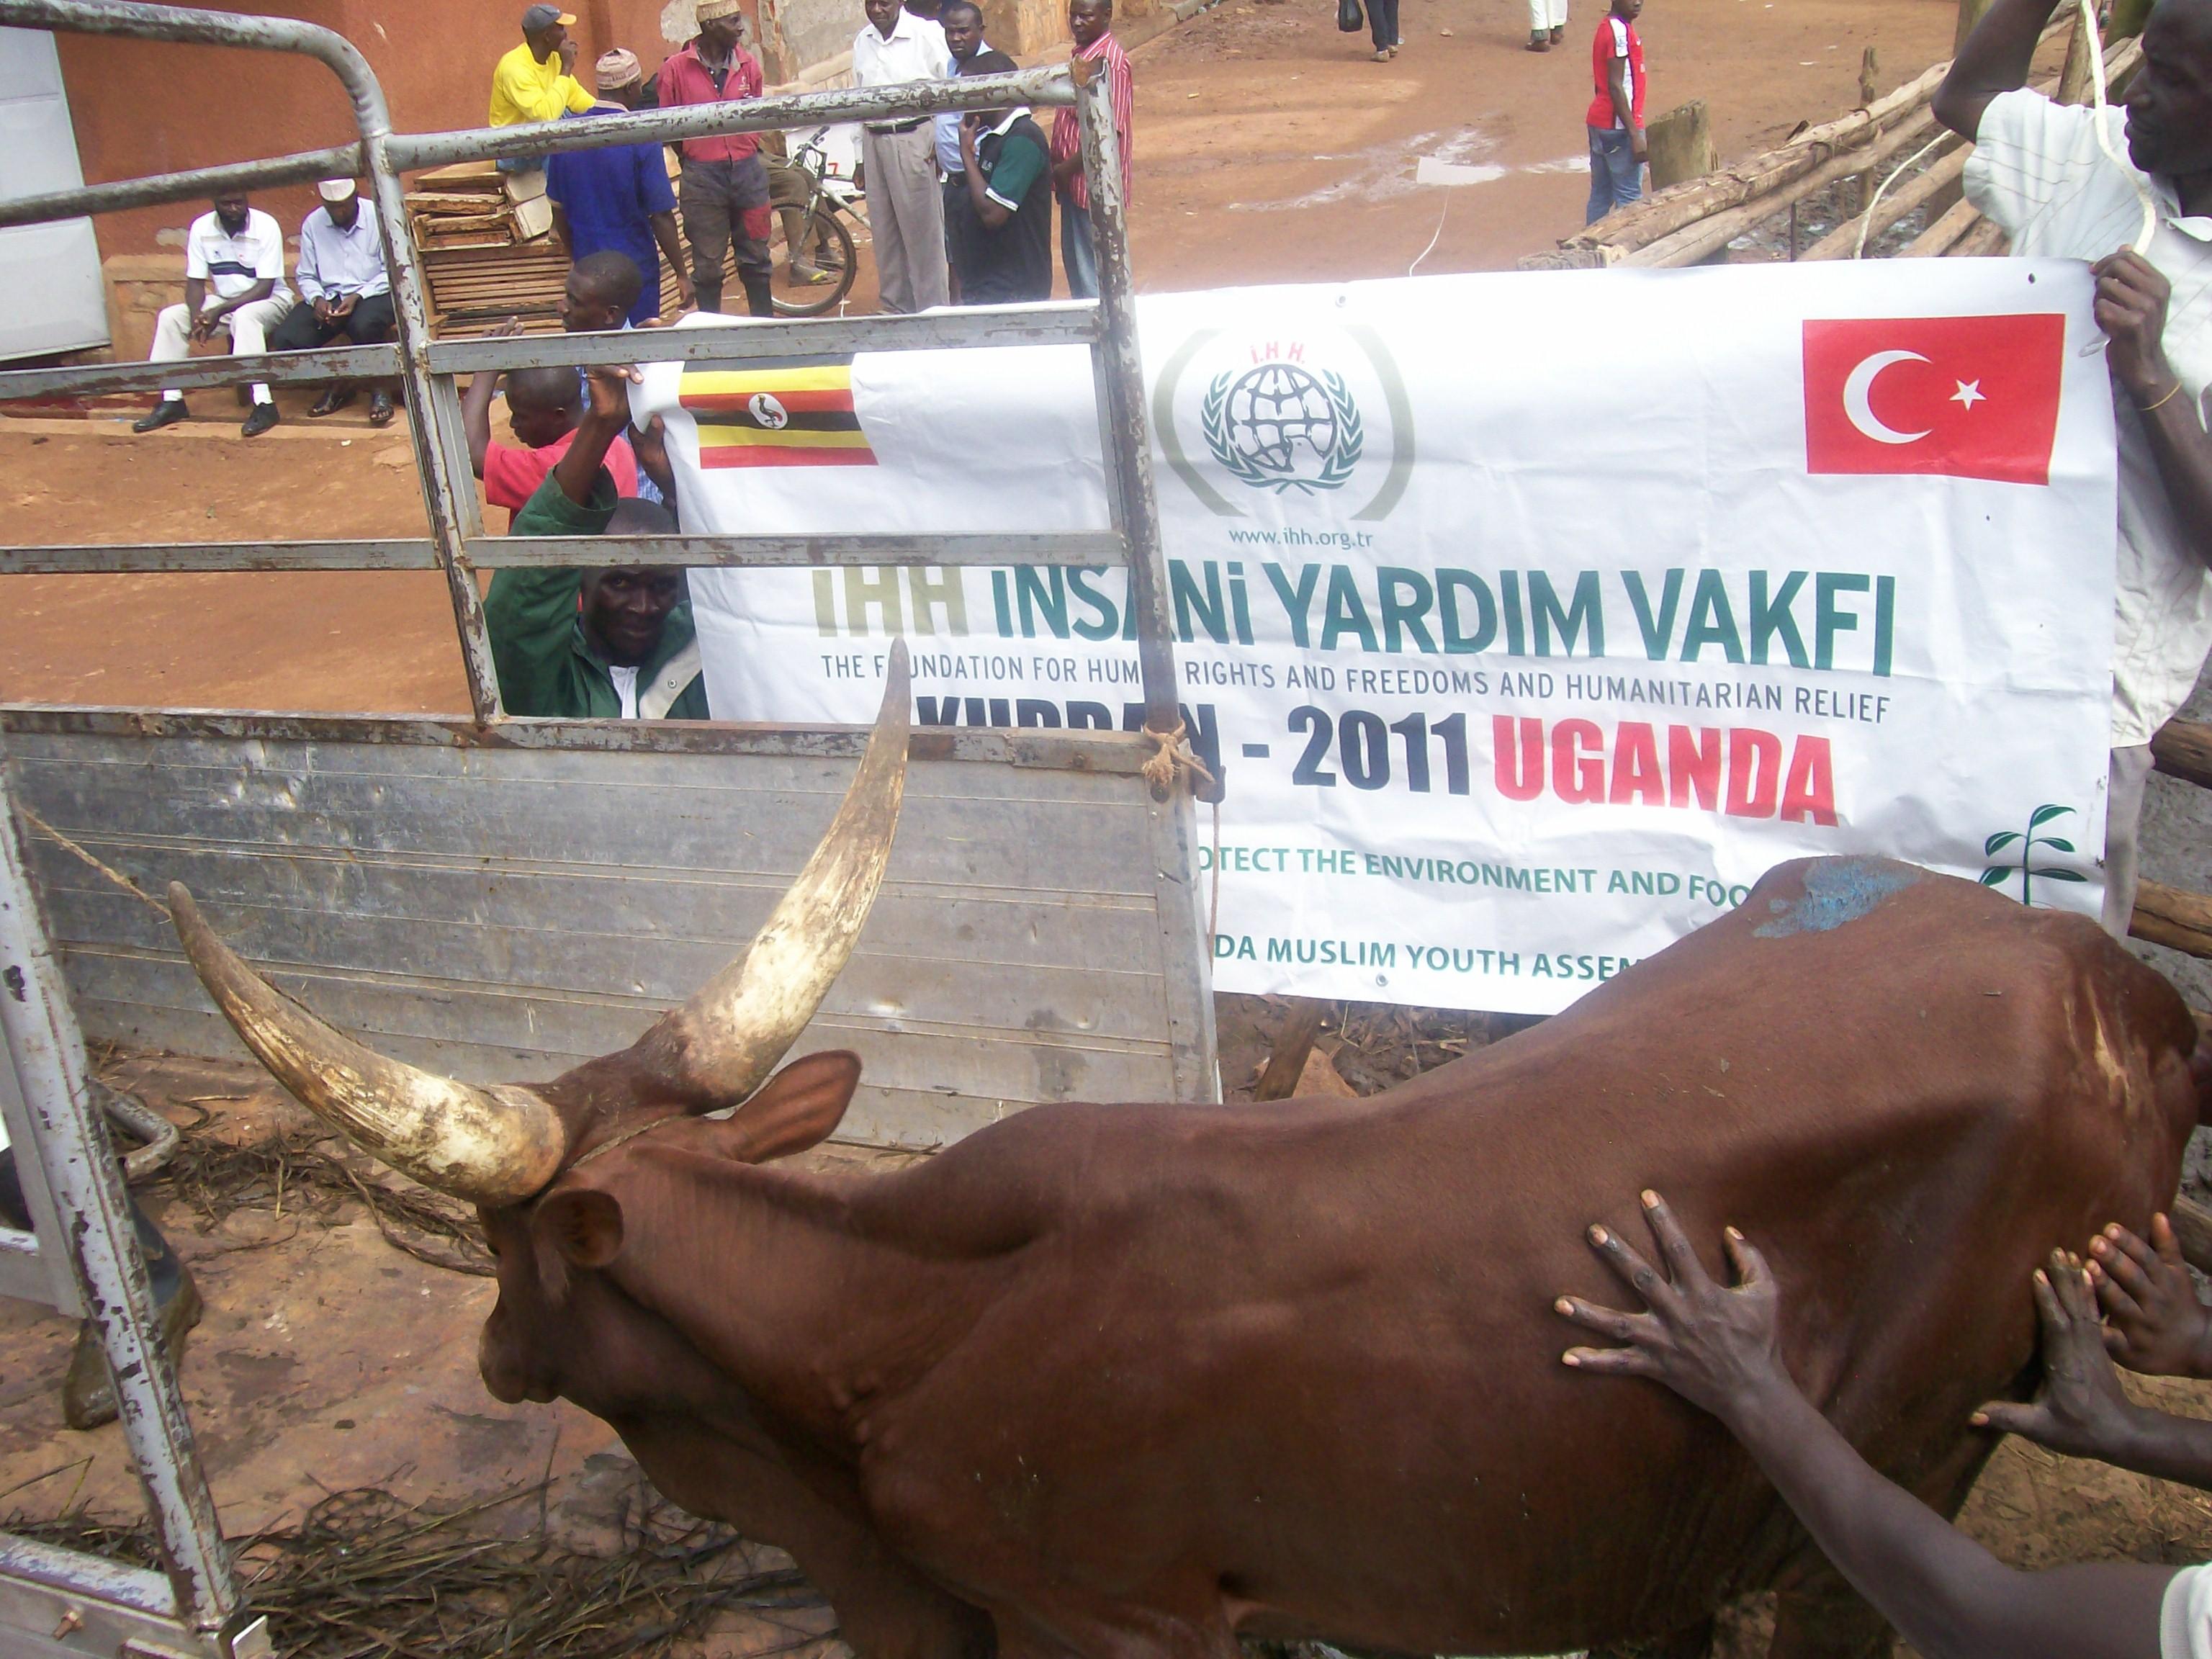 Iddil uganda muslim brothers and sistersumbs marhaban immam kasozi m4hsunfo